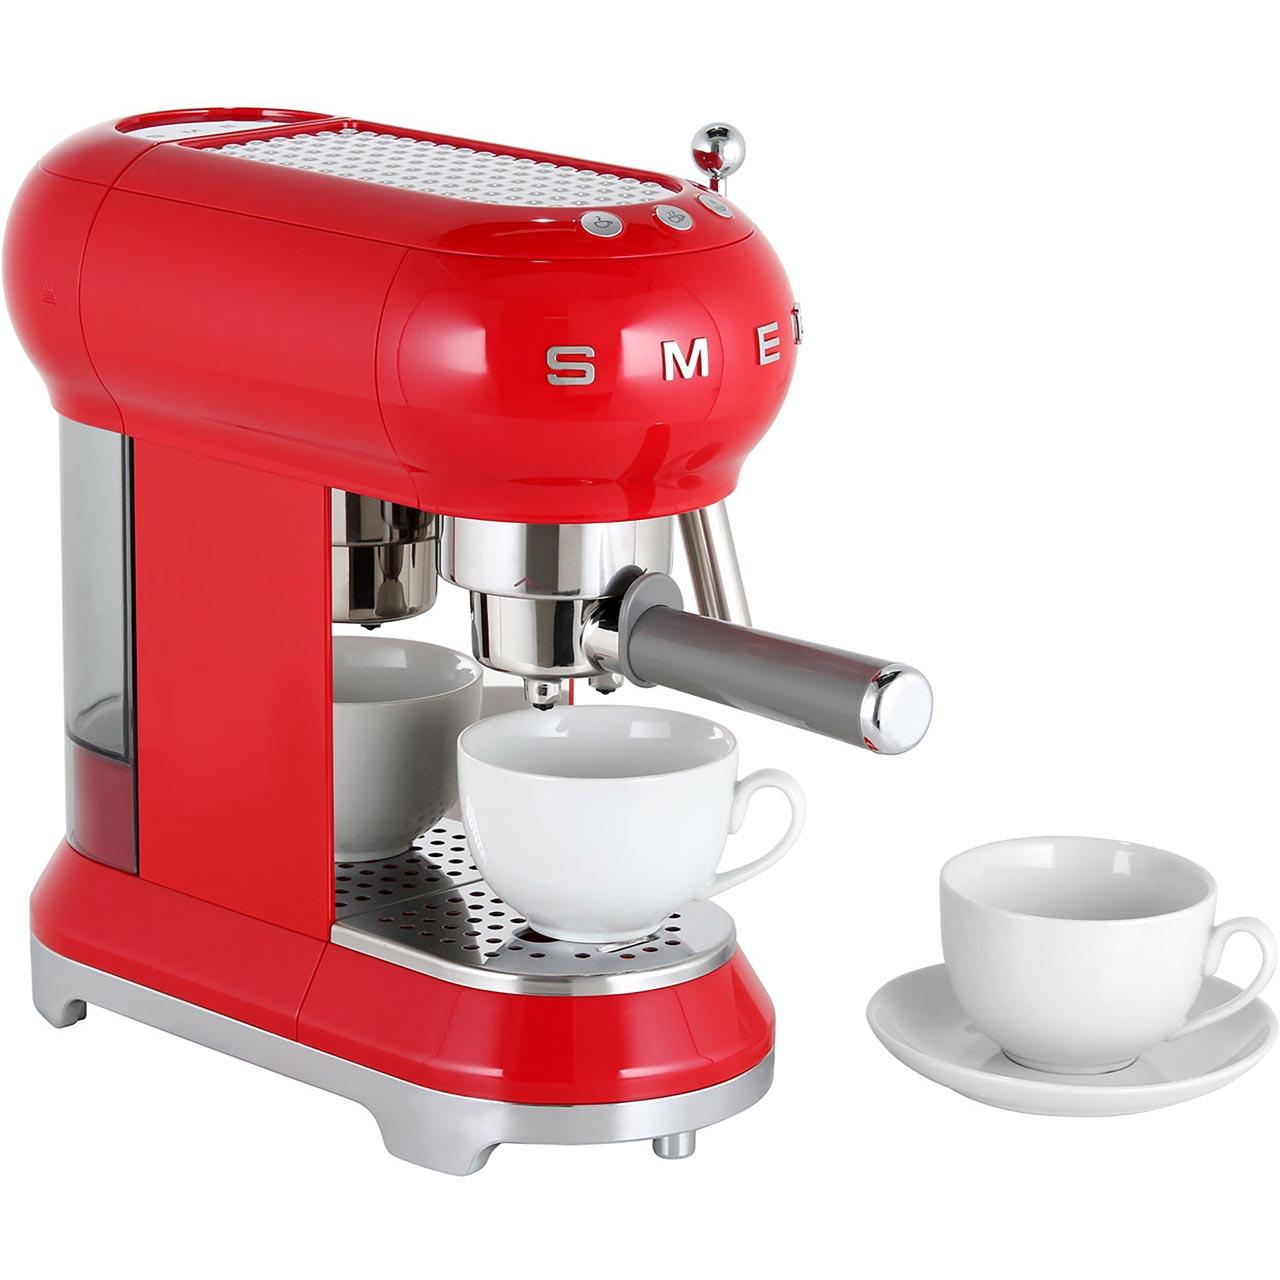 smeg ecf01rduk espresso coffee machine review. Black Bedroom Furniture Sets. Home Design Ideas